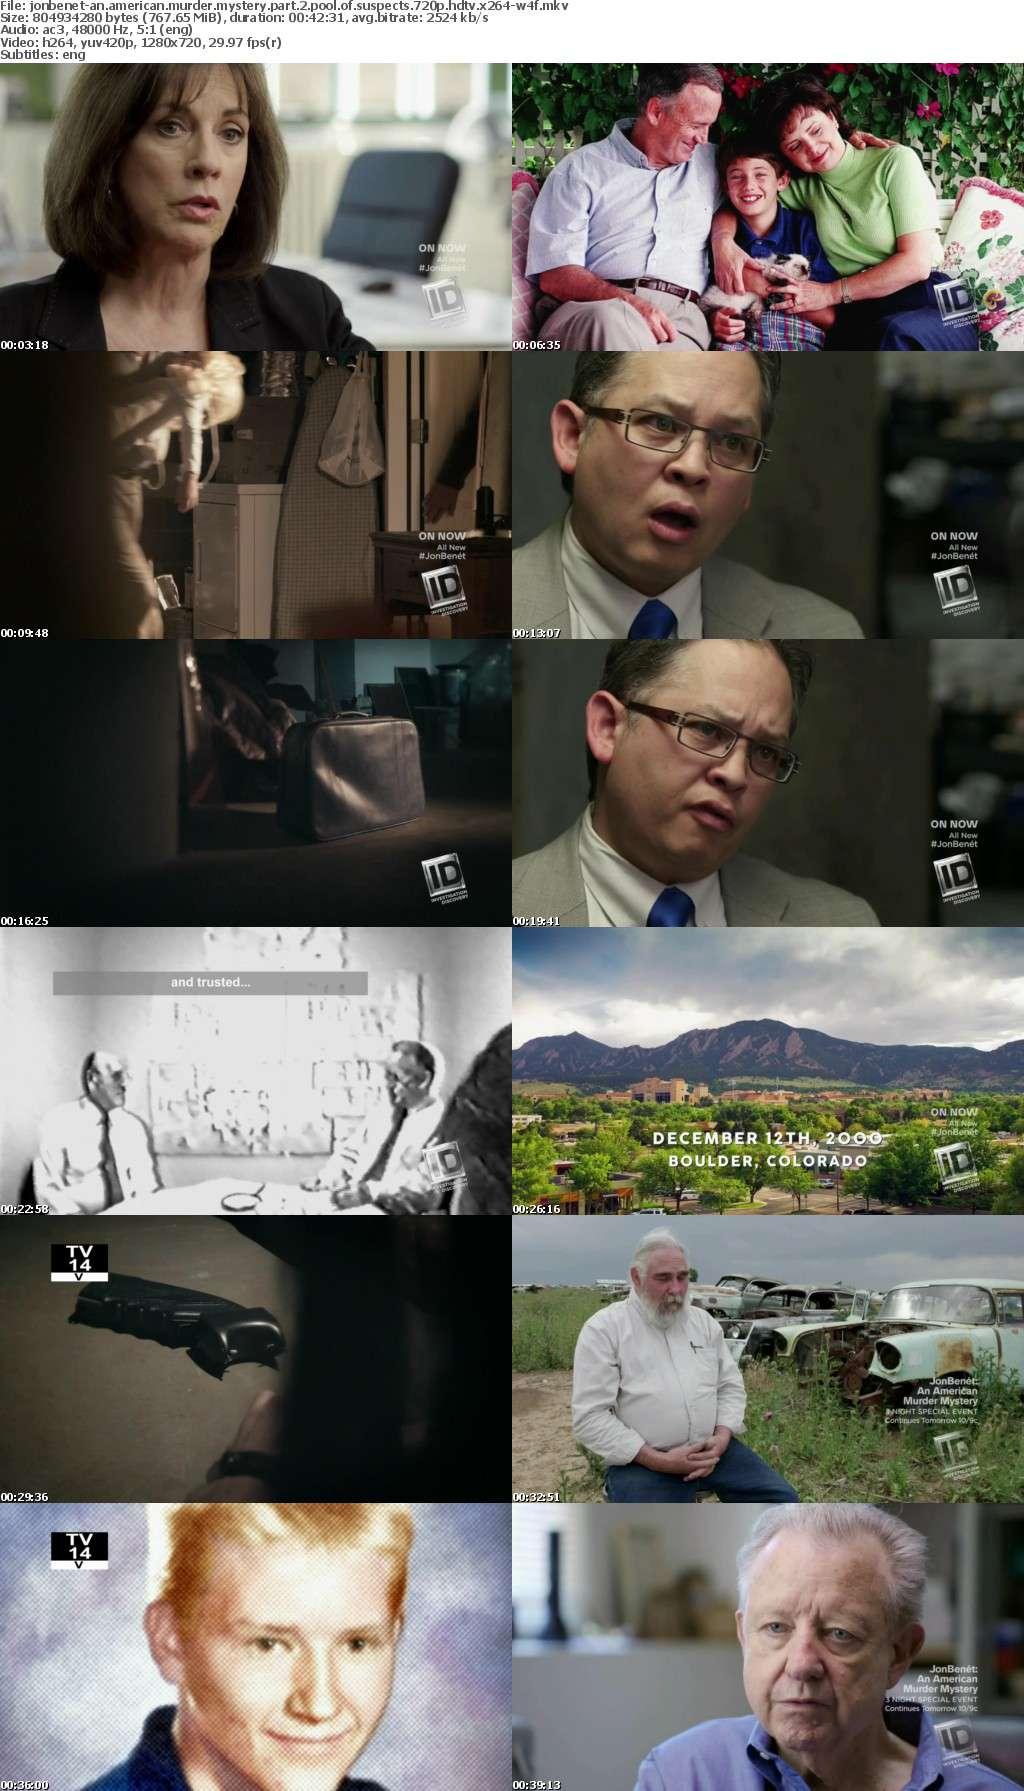 JonBenet-An American Murder Mystery Part 2 Pool of Suspects 720p HDTV x264-W4F